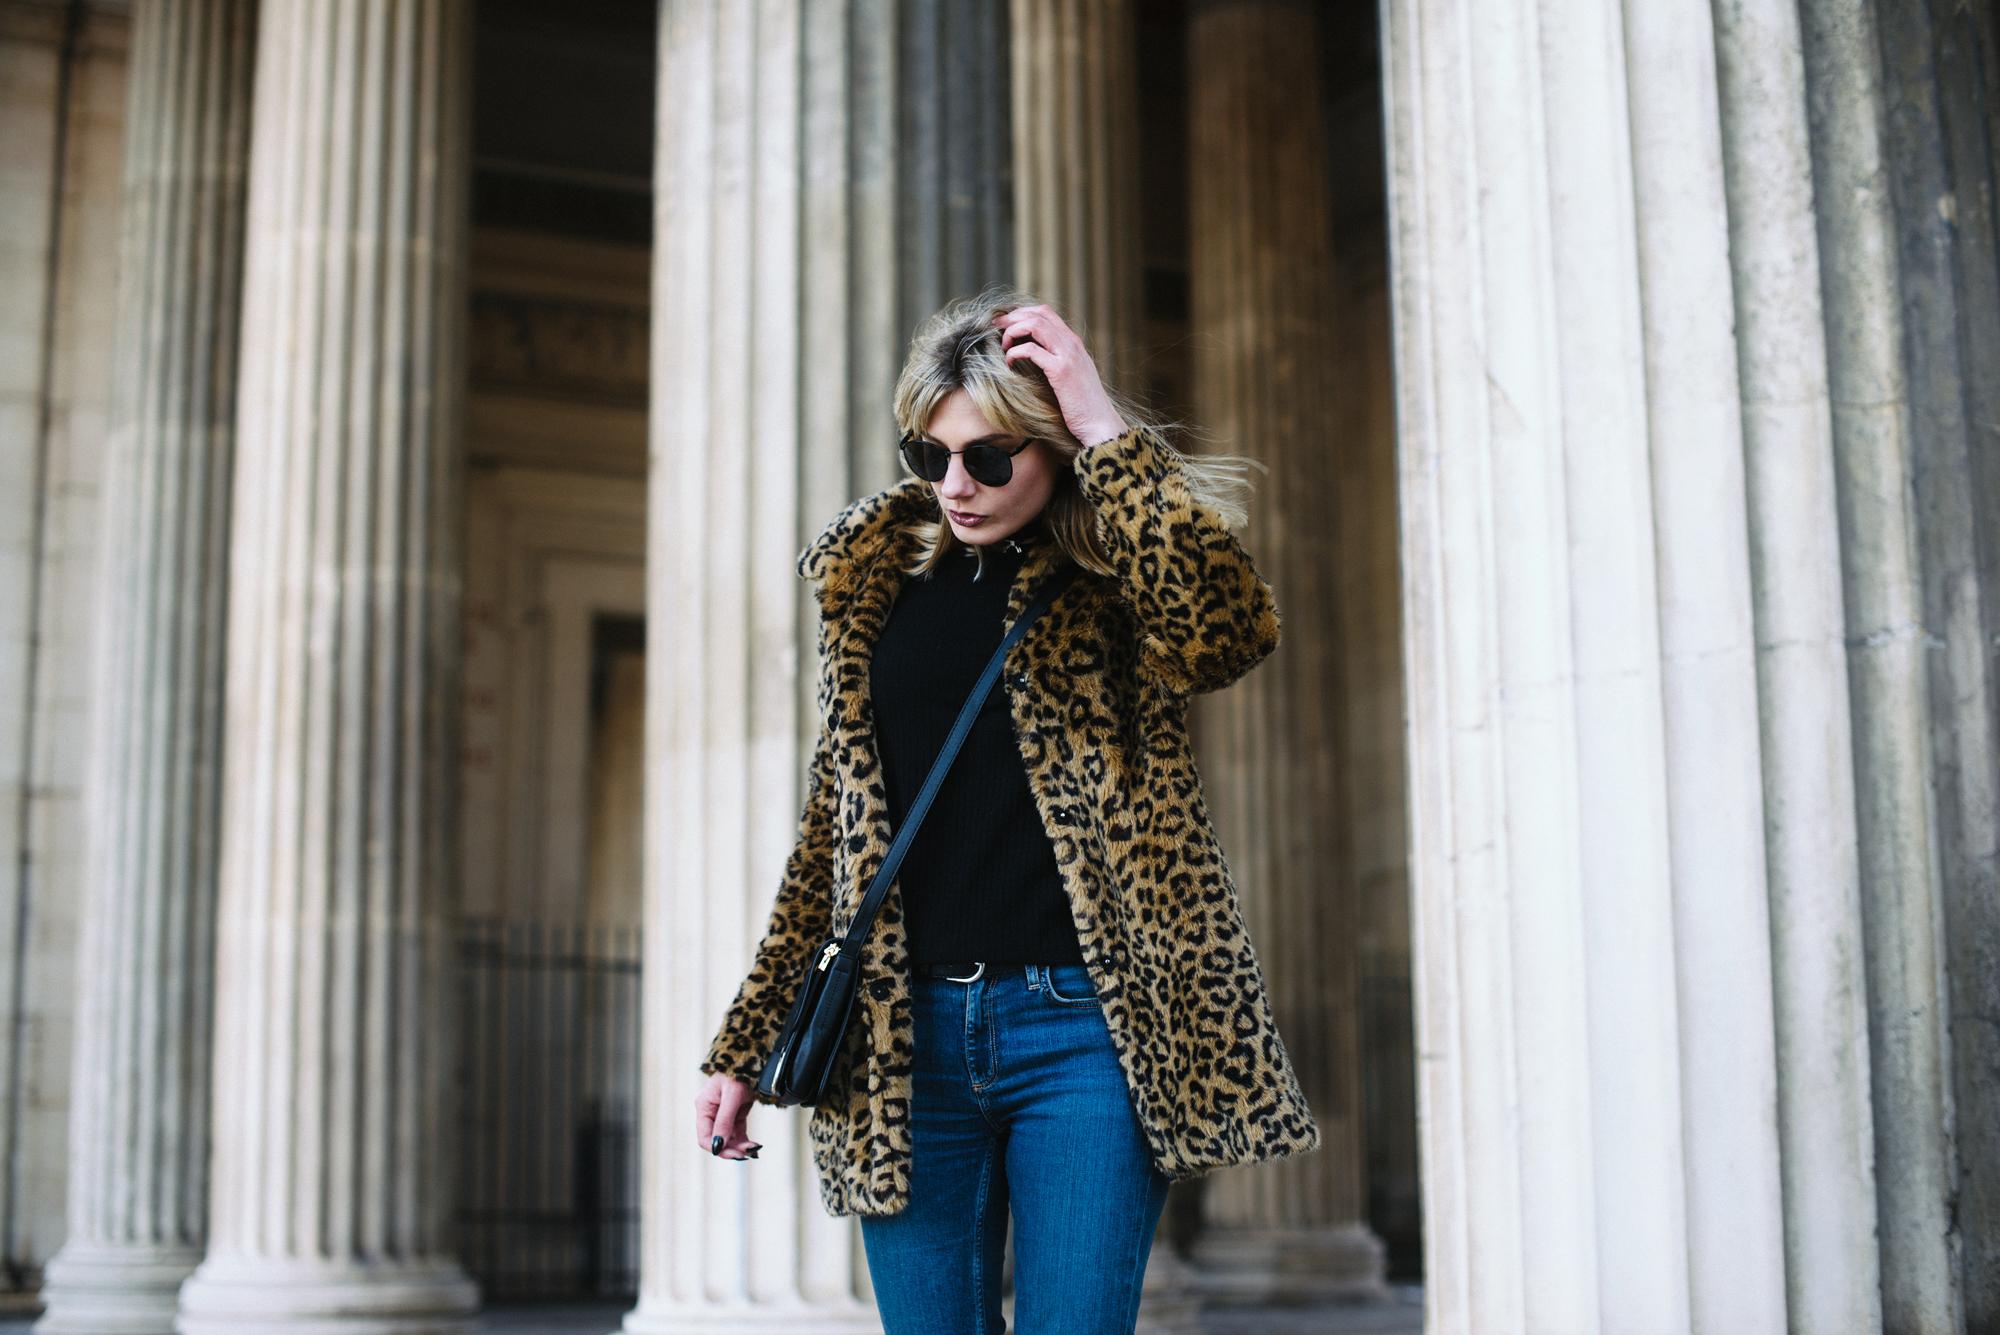 Kiamisu_Modeblog_Fashionblog_Beautyblog_Leo Mantel_Zara_Leo Mantel kombinieren-14